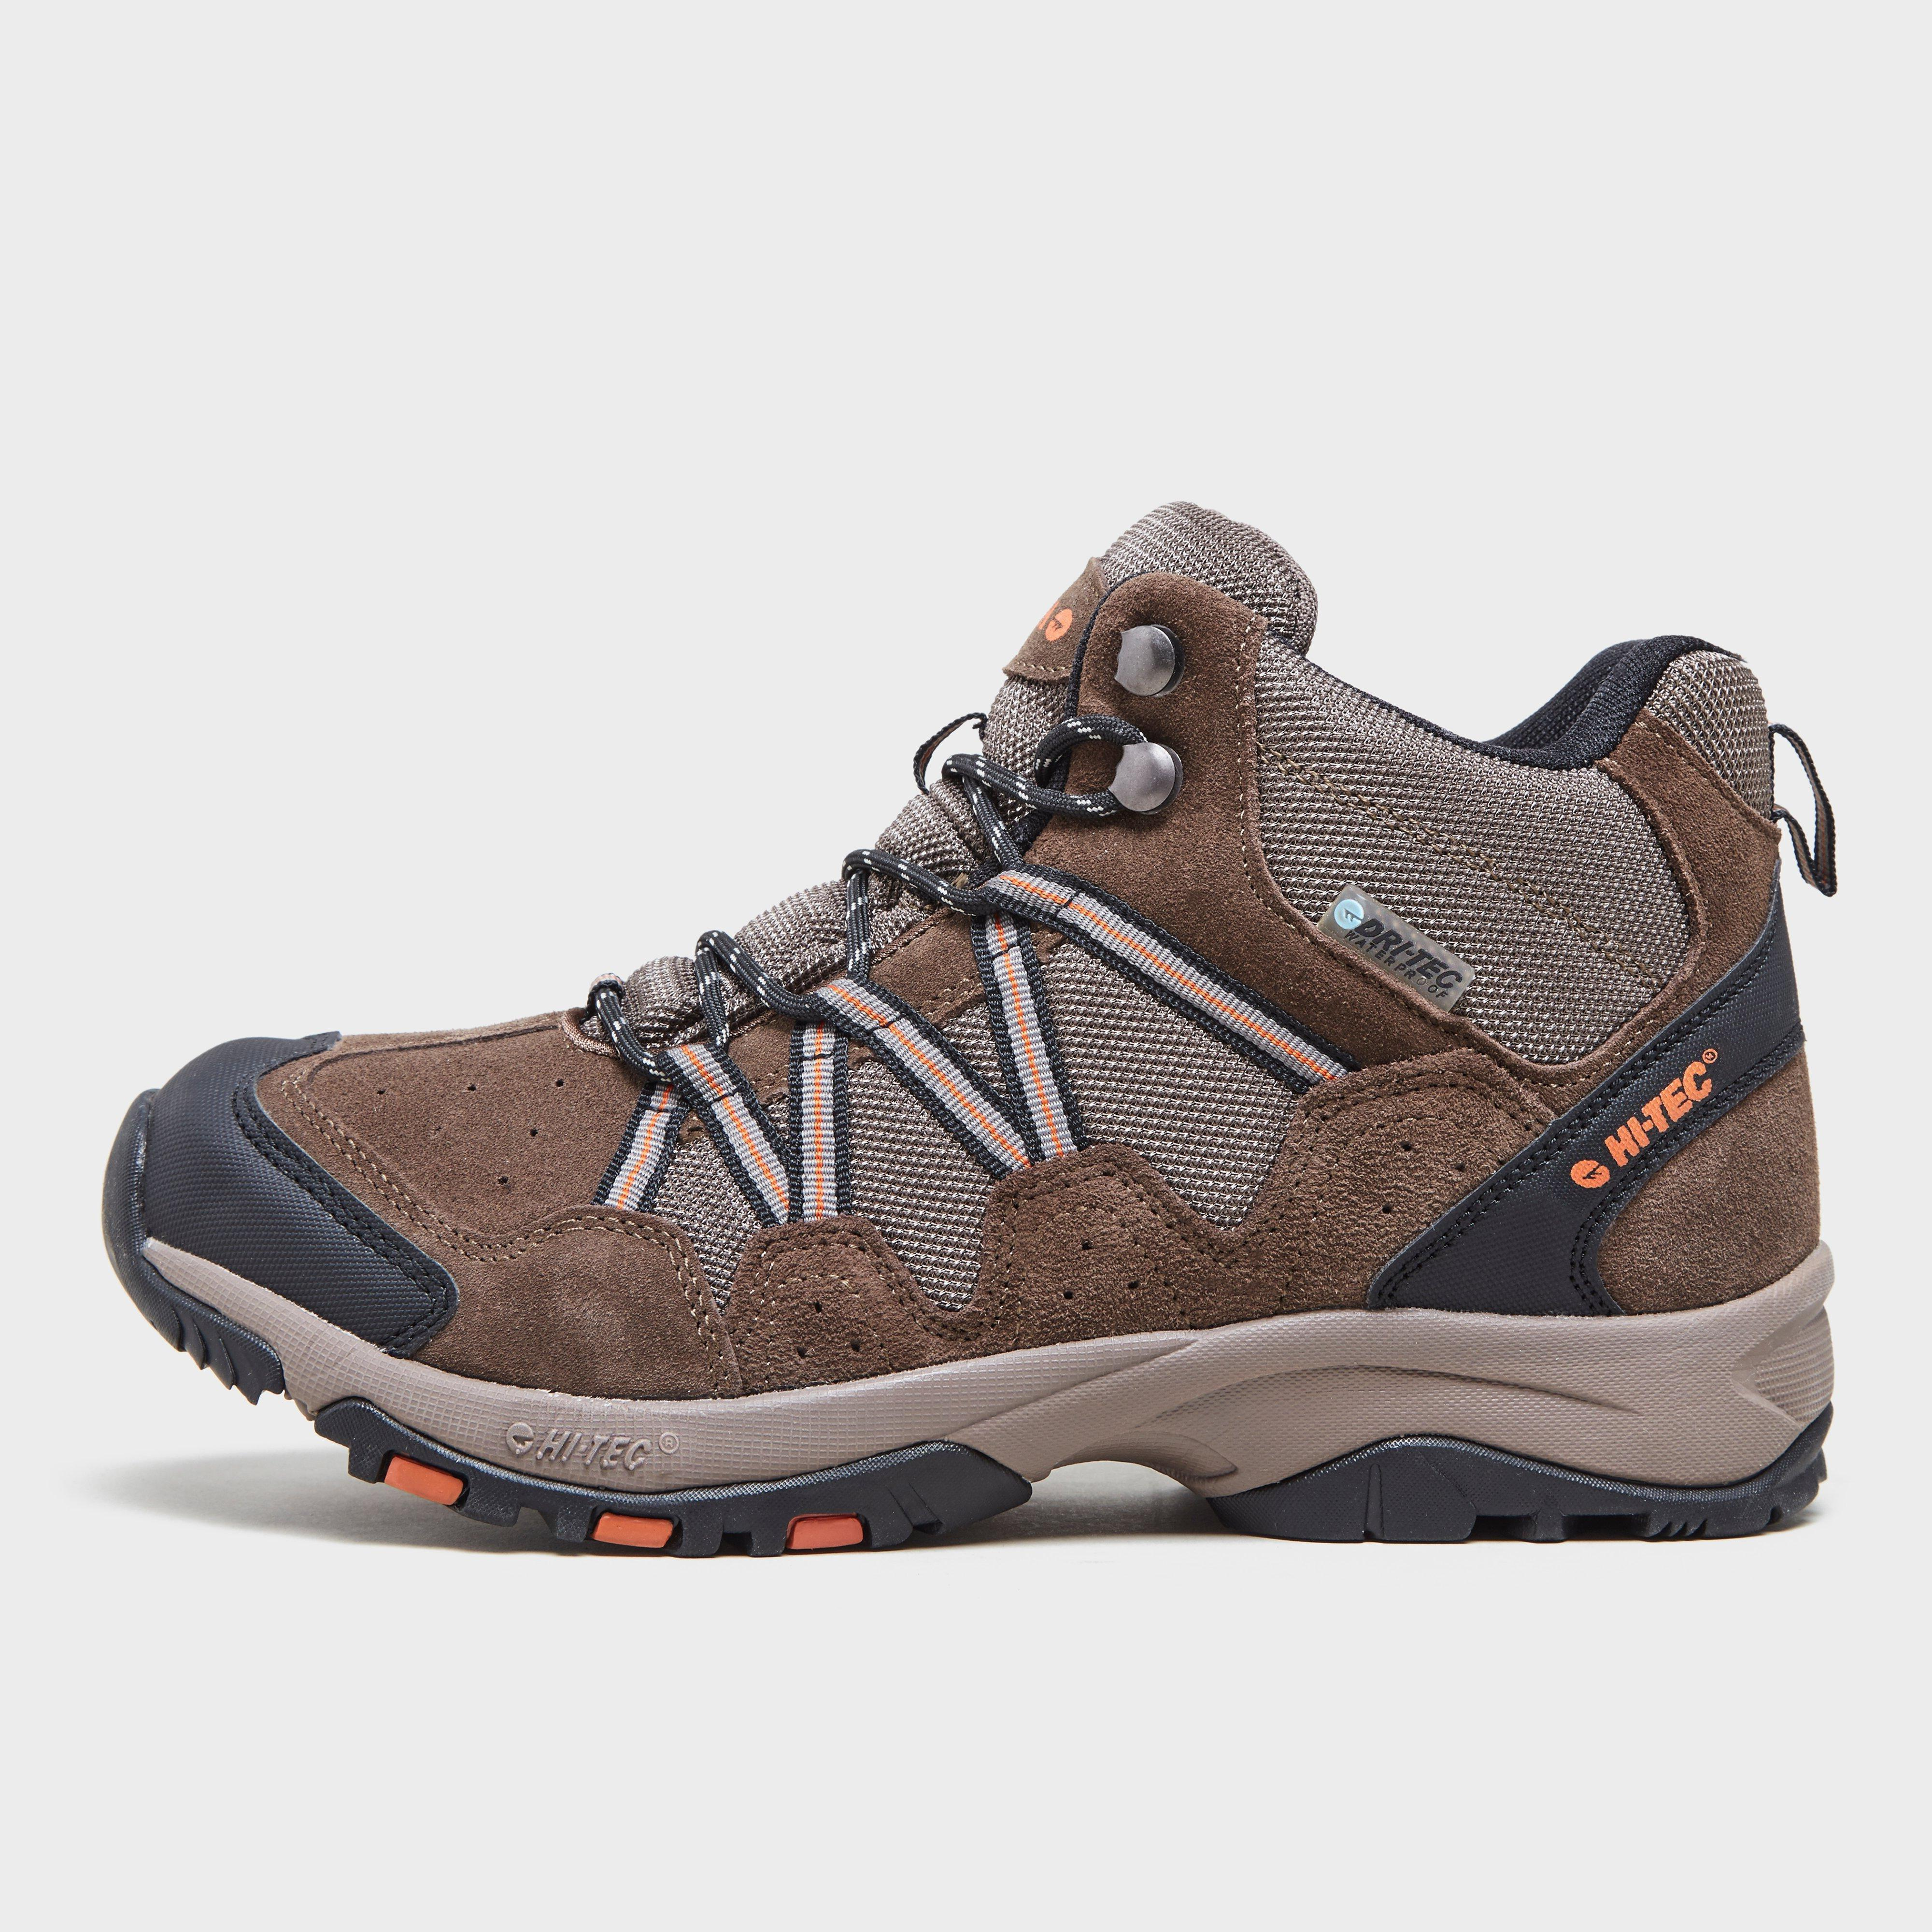 ac414e954640 Brown HI TEC Men s Dexter Waterproof Mid Hiking Shoe image 1